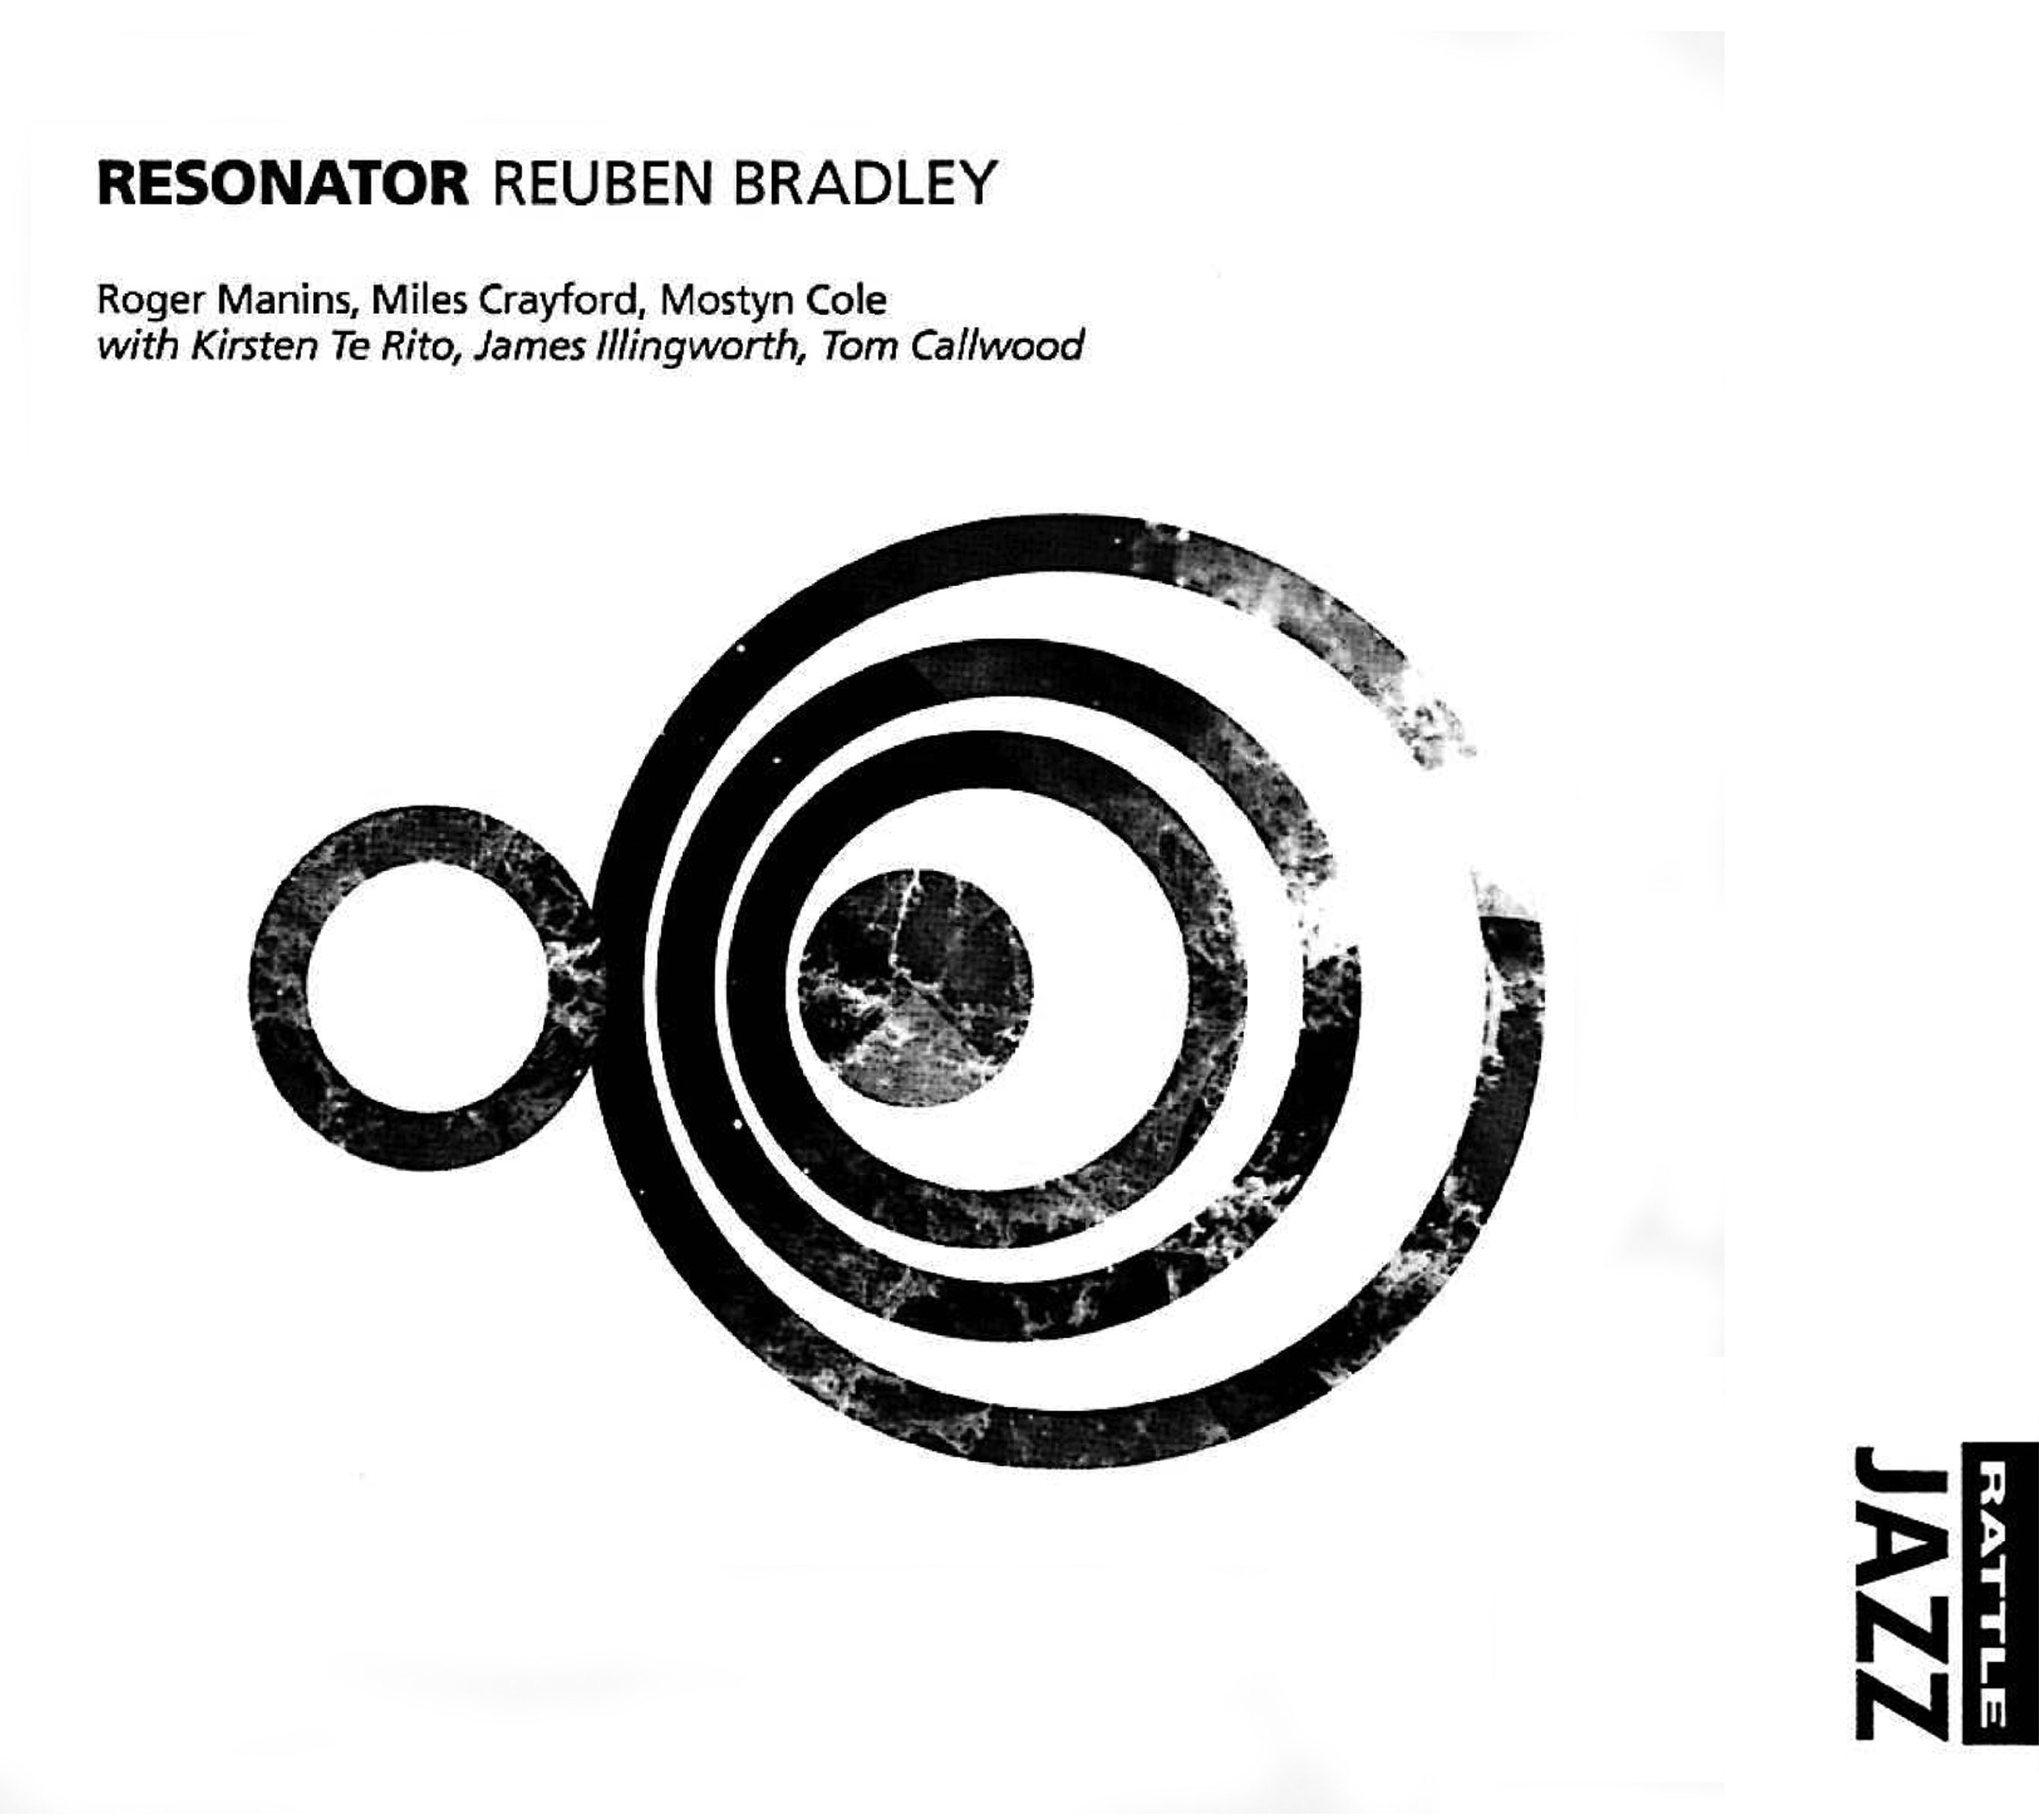 Reuben Bradley   Resonator - downloadable MP3 ALBUM